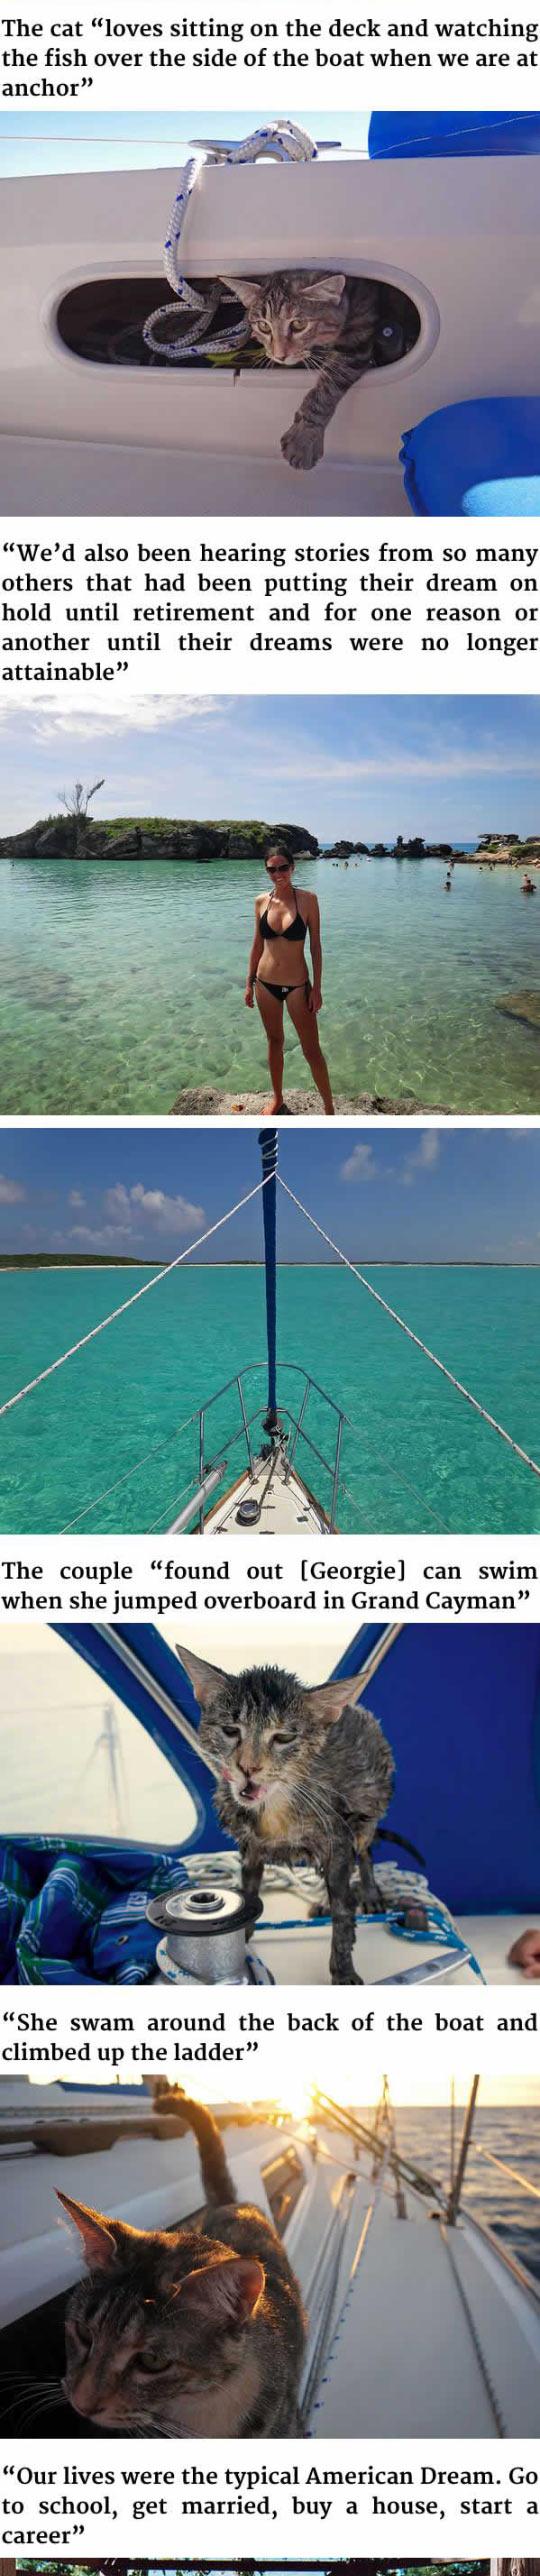 3funny-couple-quit-job-travel-cat-sea